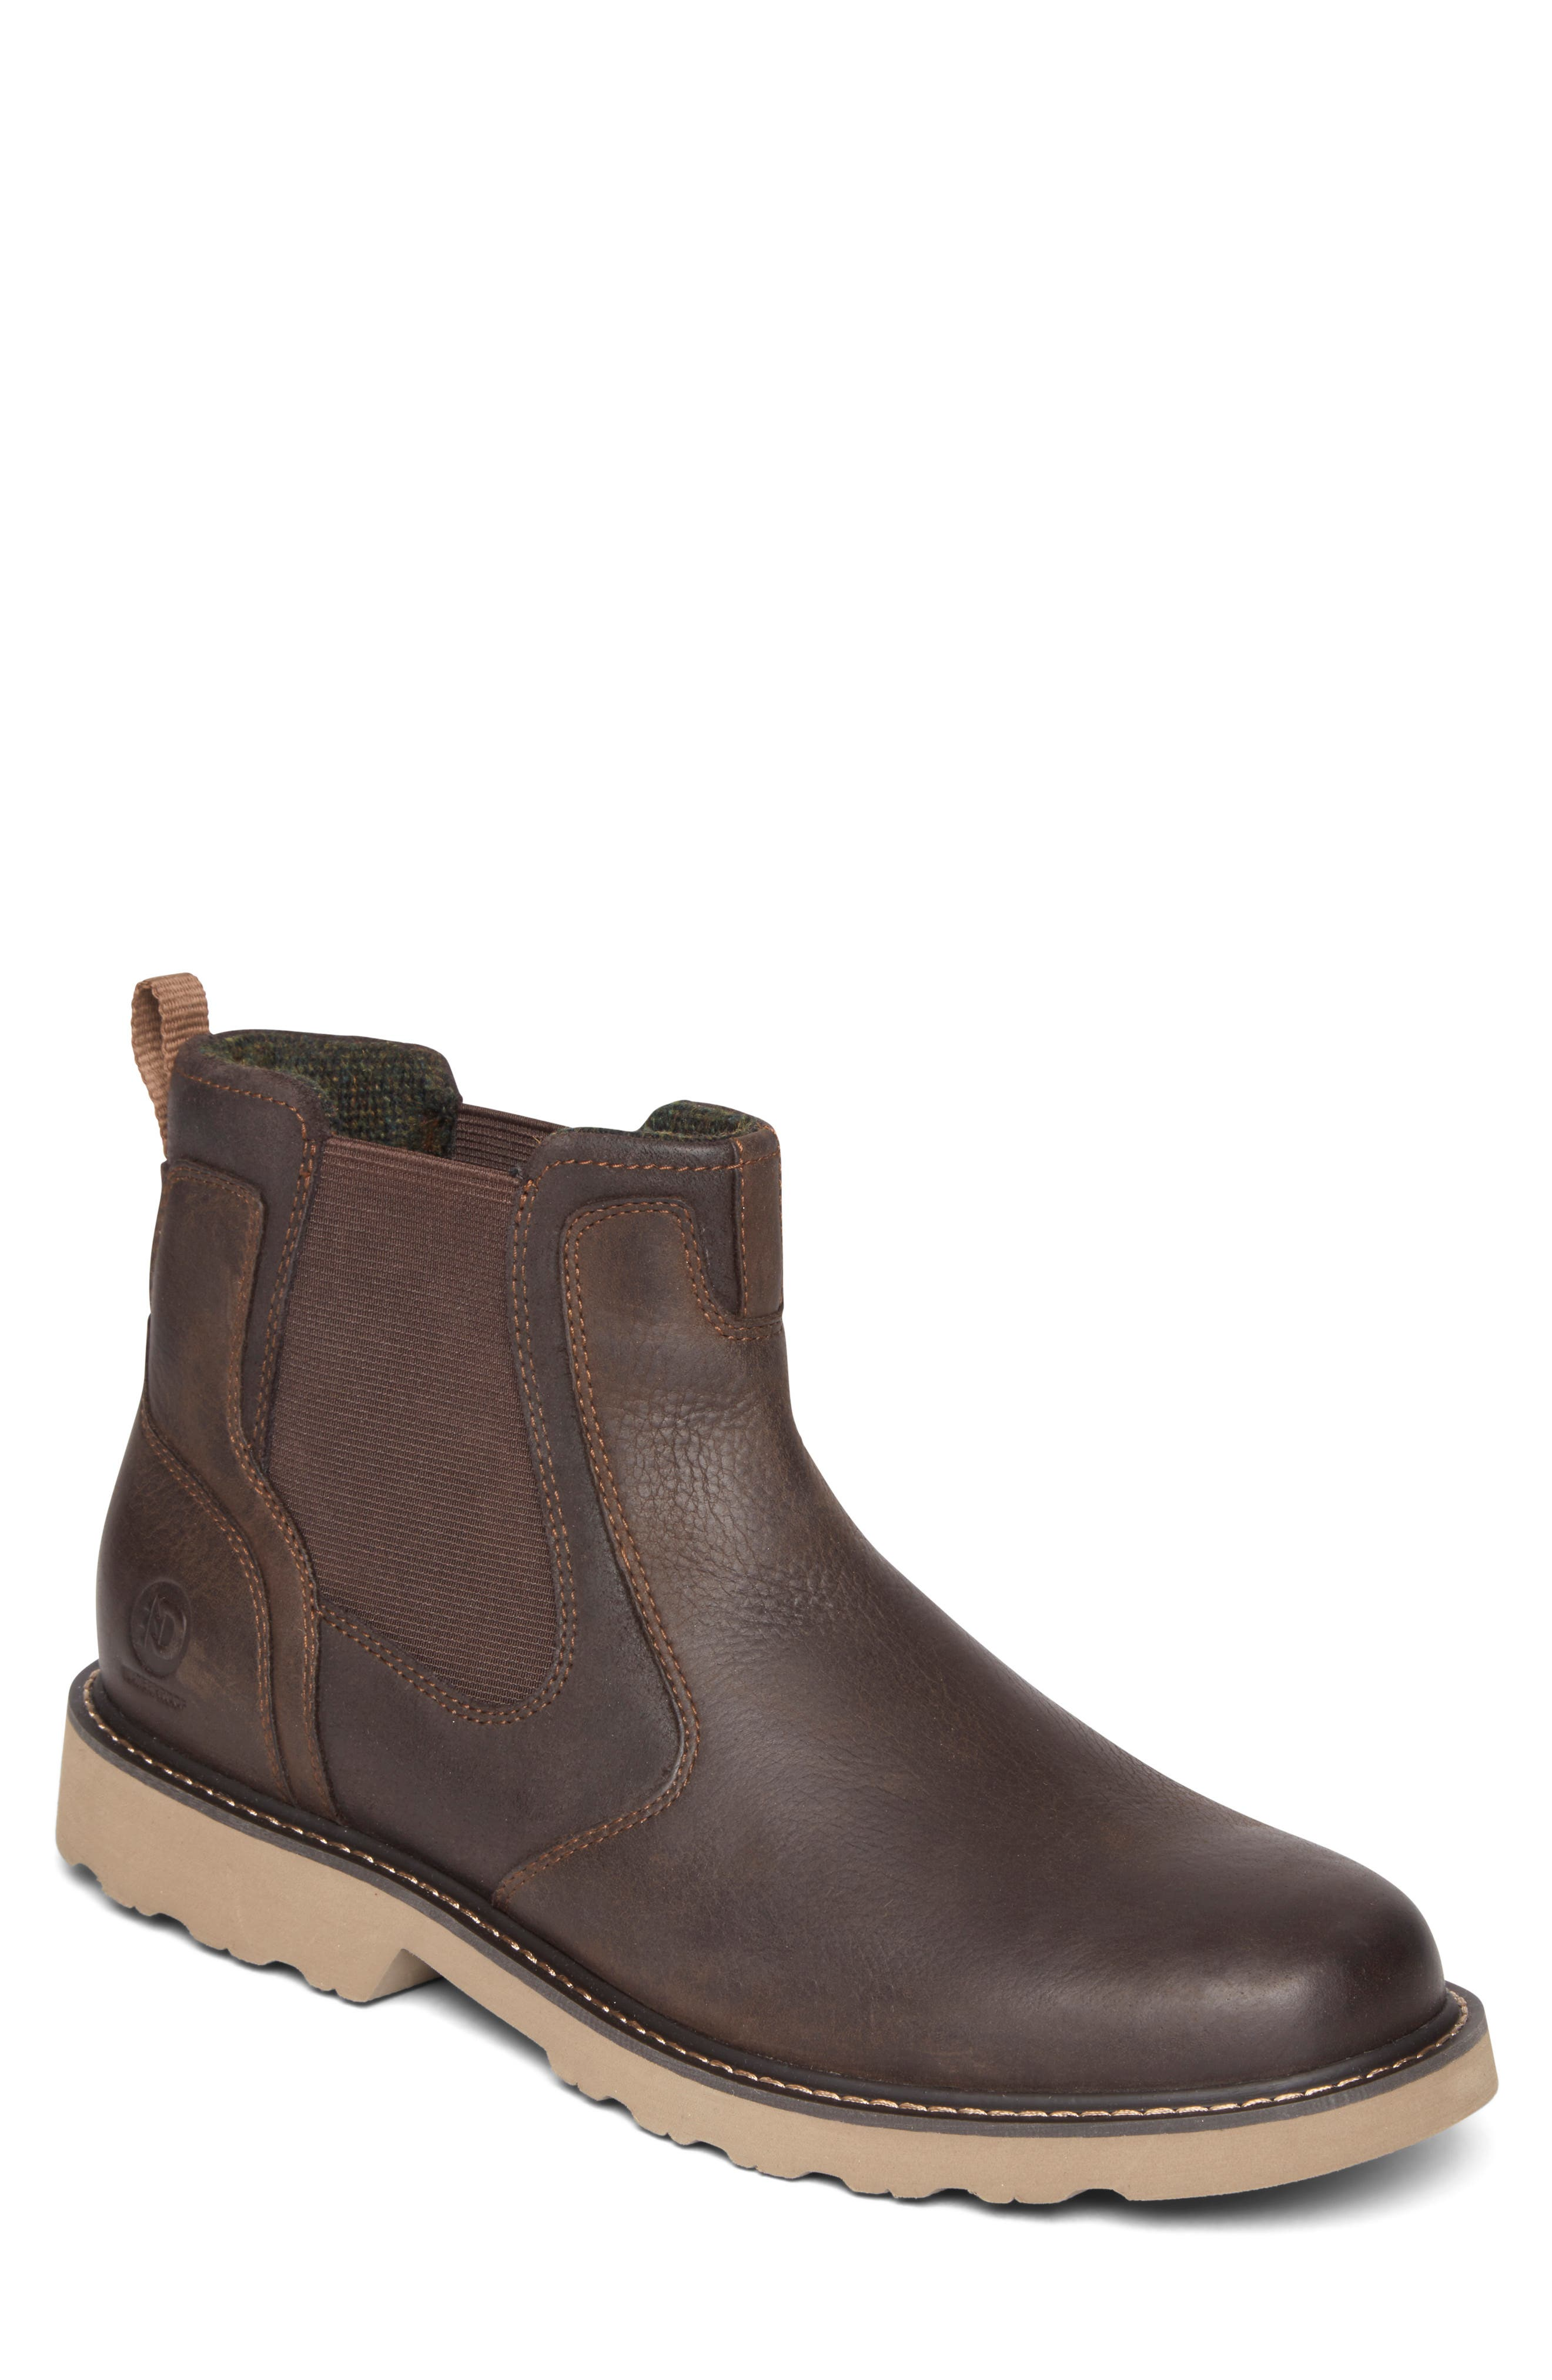 Jake Waterproof Chelsea Boot